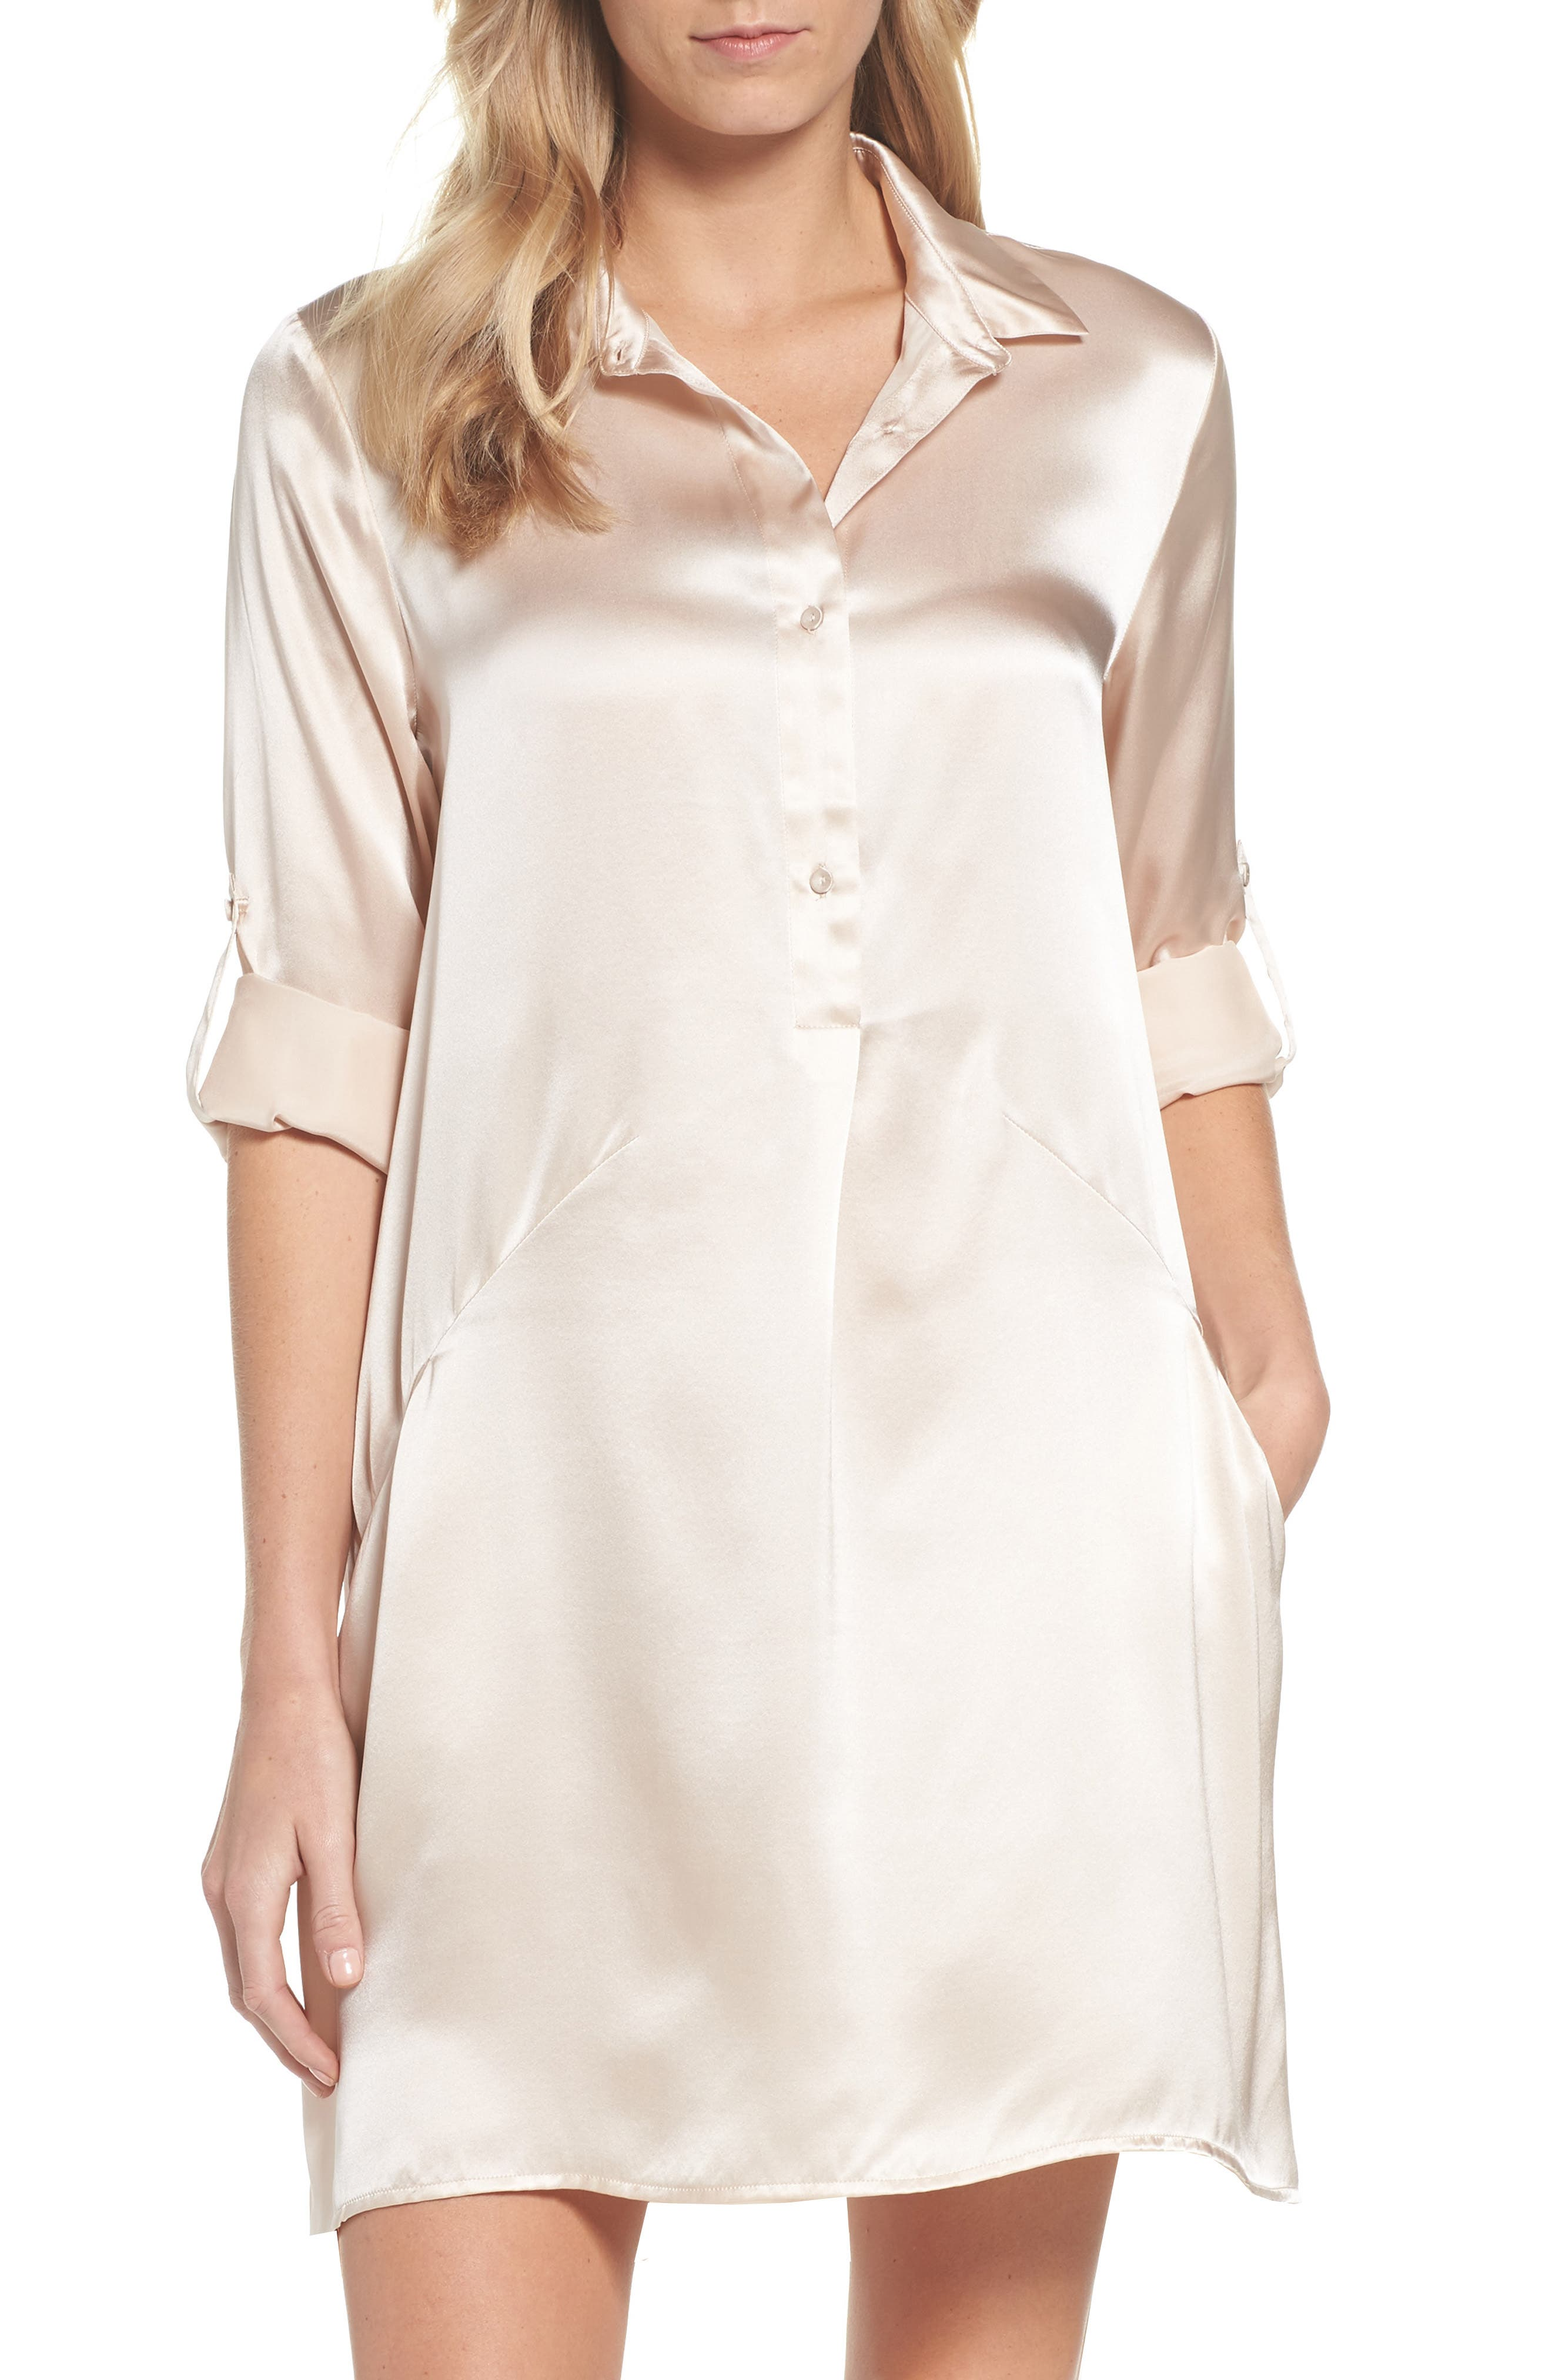 Silk Sleep Shirt,                             Main thumbnail 1, color,                             900